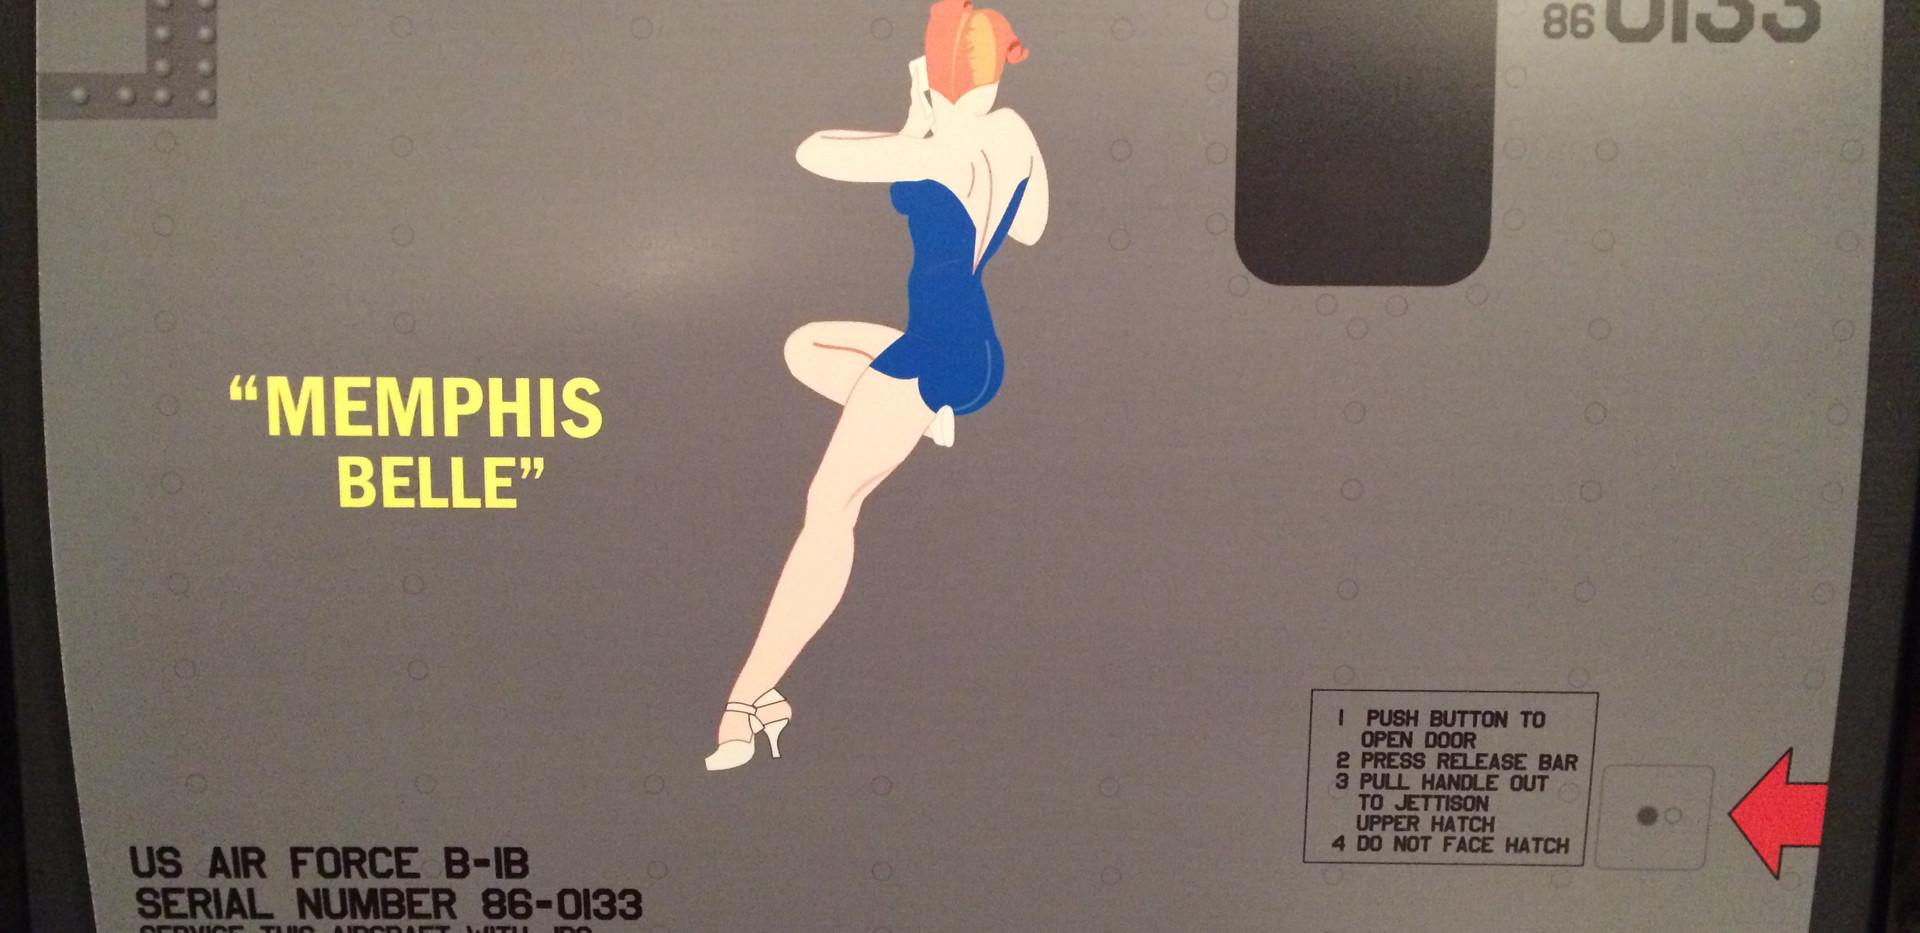 B-1 Memphis Belle